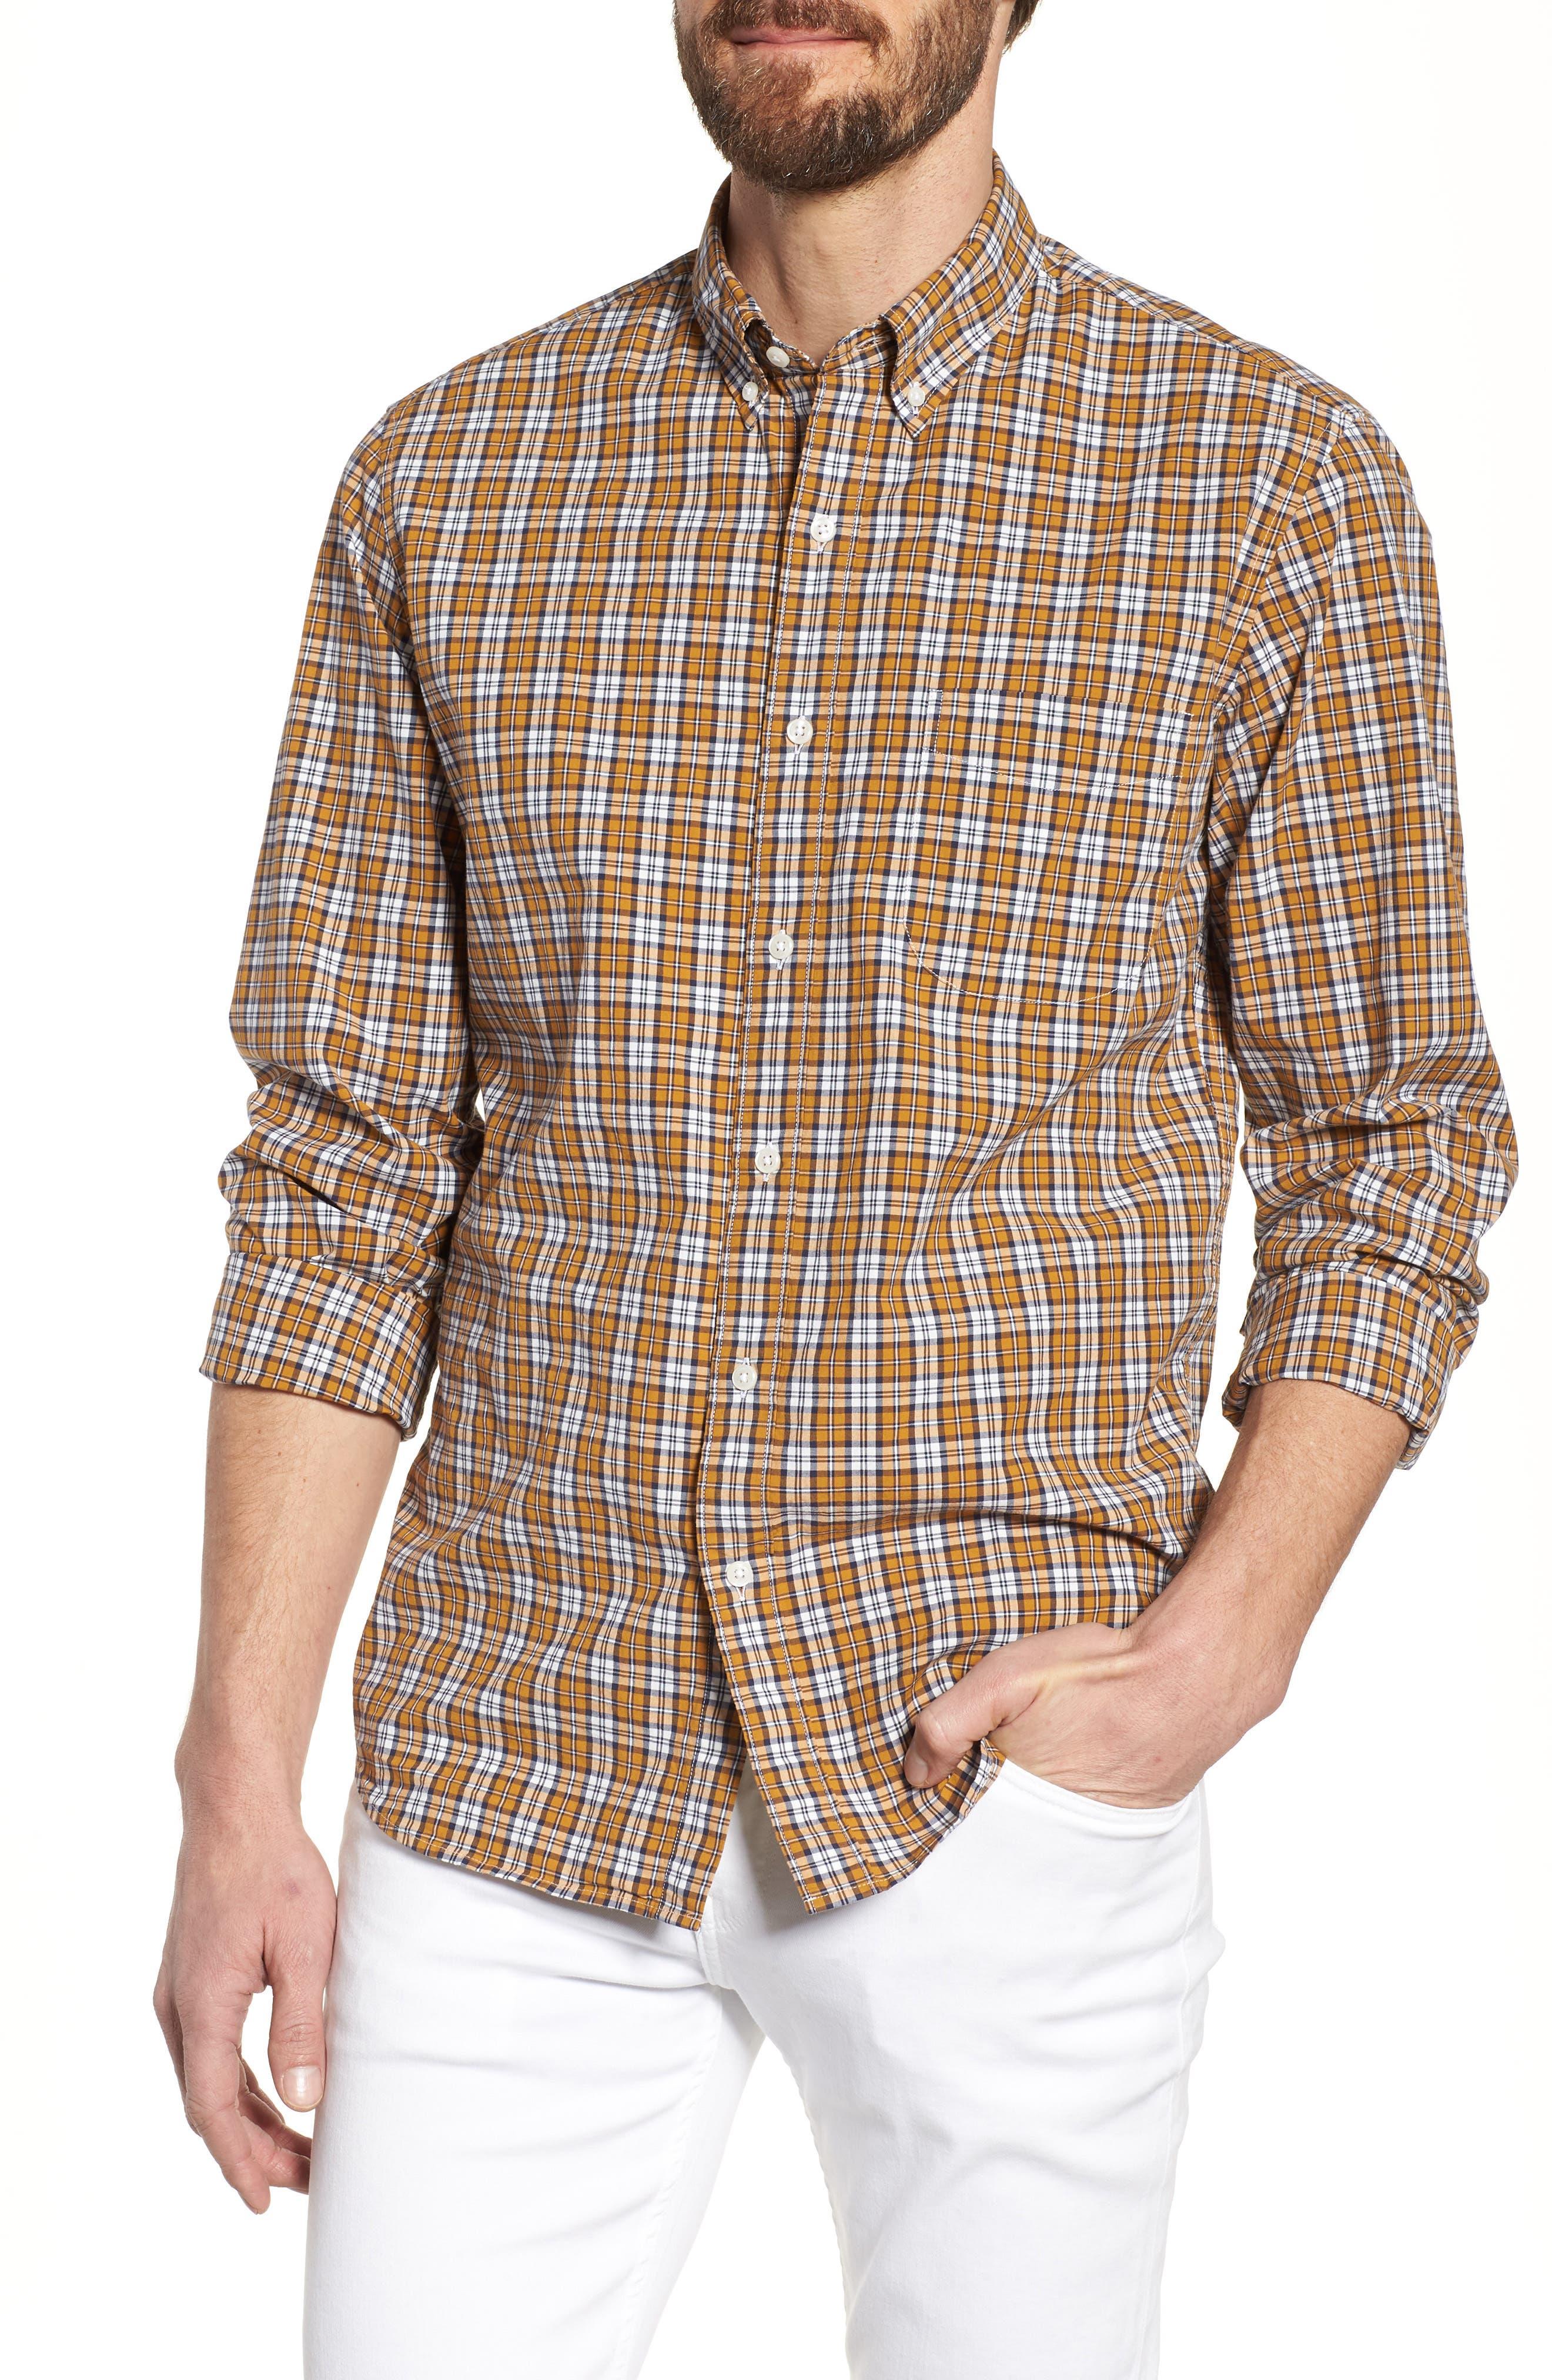 J.Crew Slim Fit Stretch Secret Wash Plaid Sport Shirt,                         Main,                         color, Warm Cider